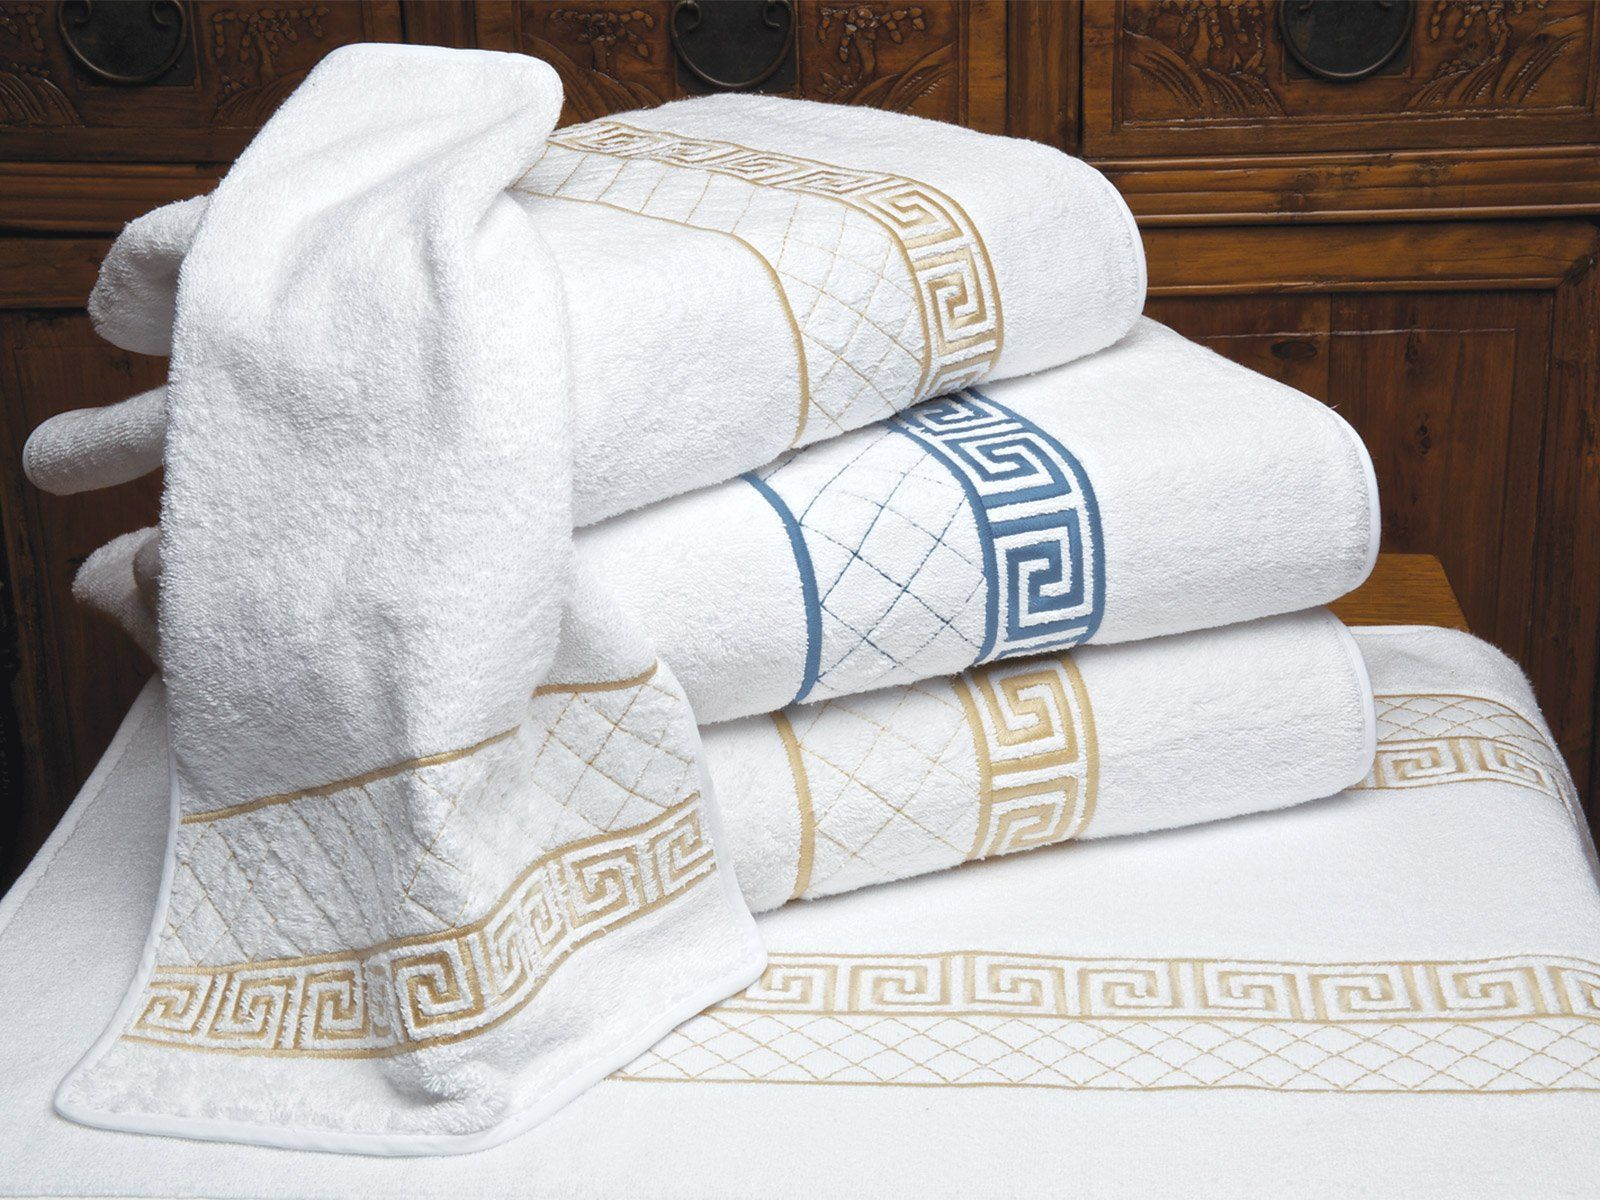 Acropolis Towels Clic Greek Key